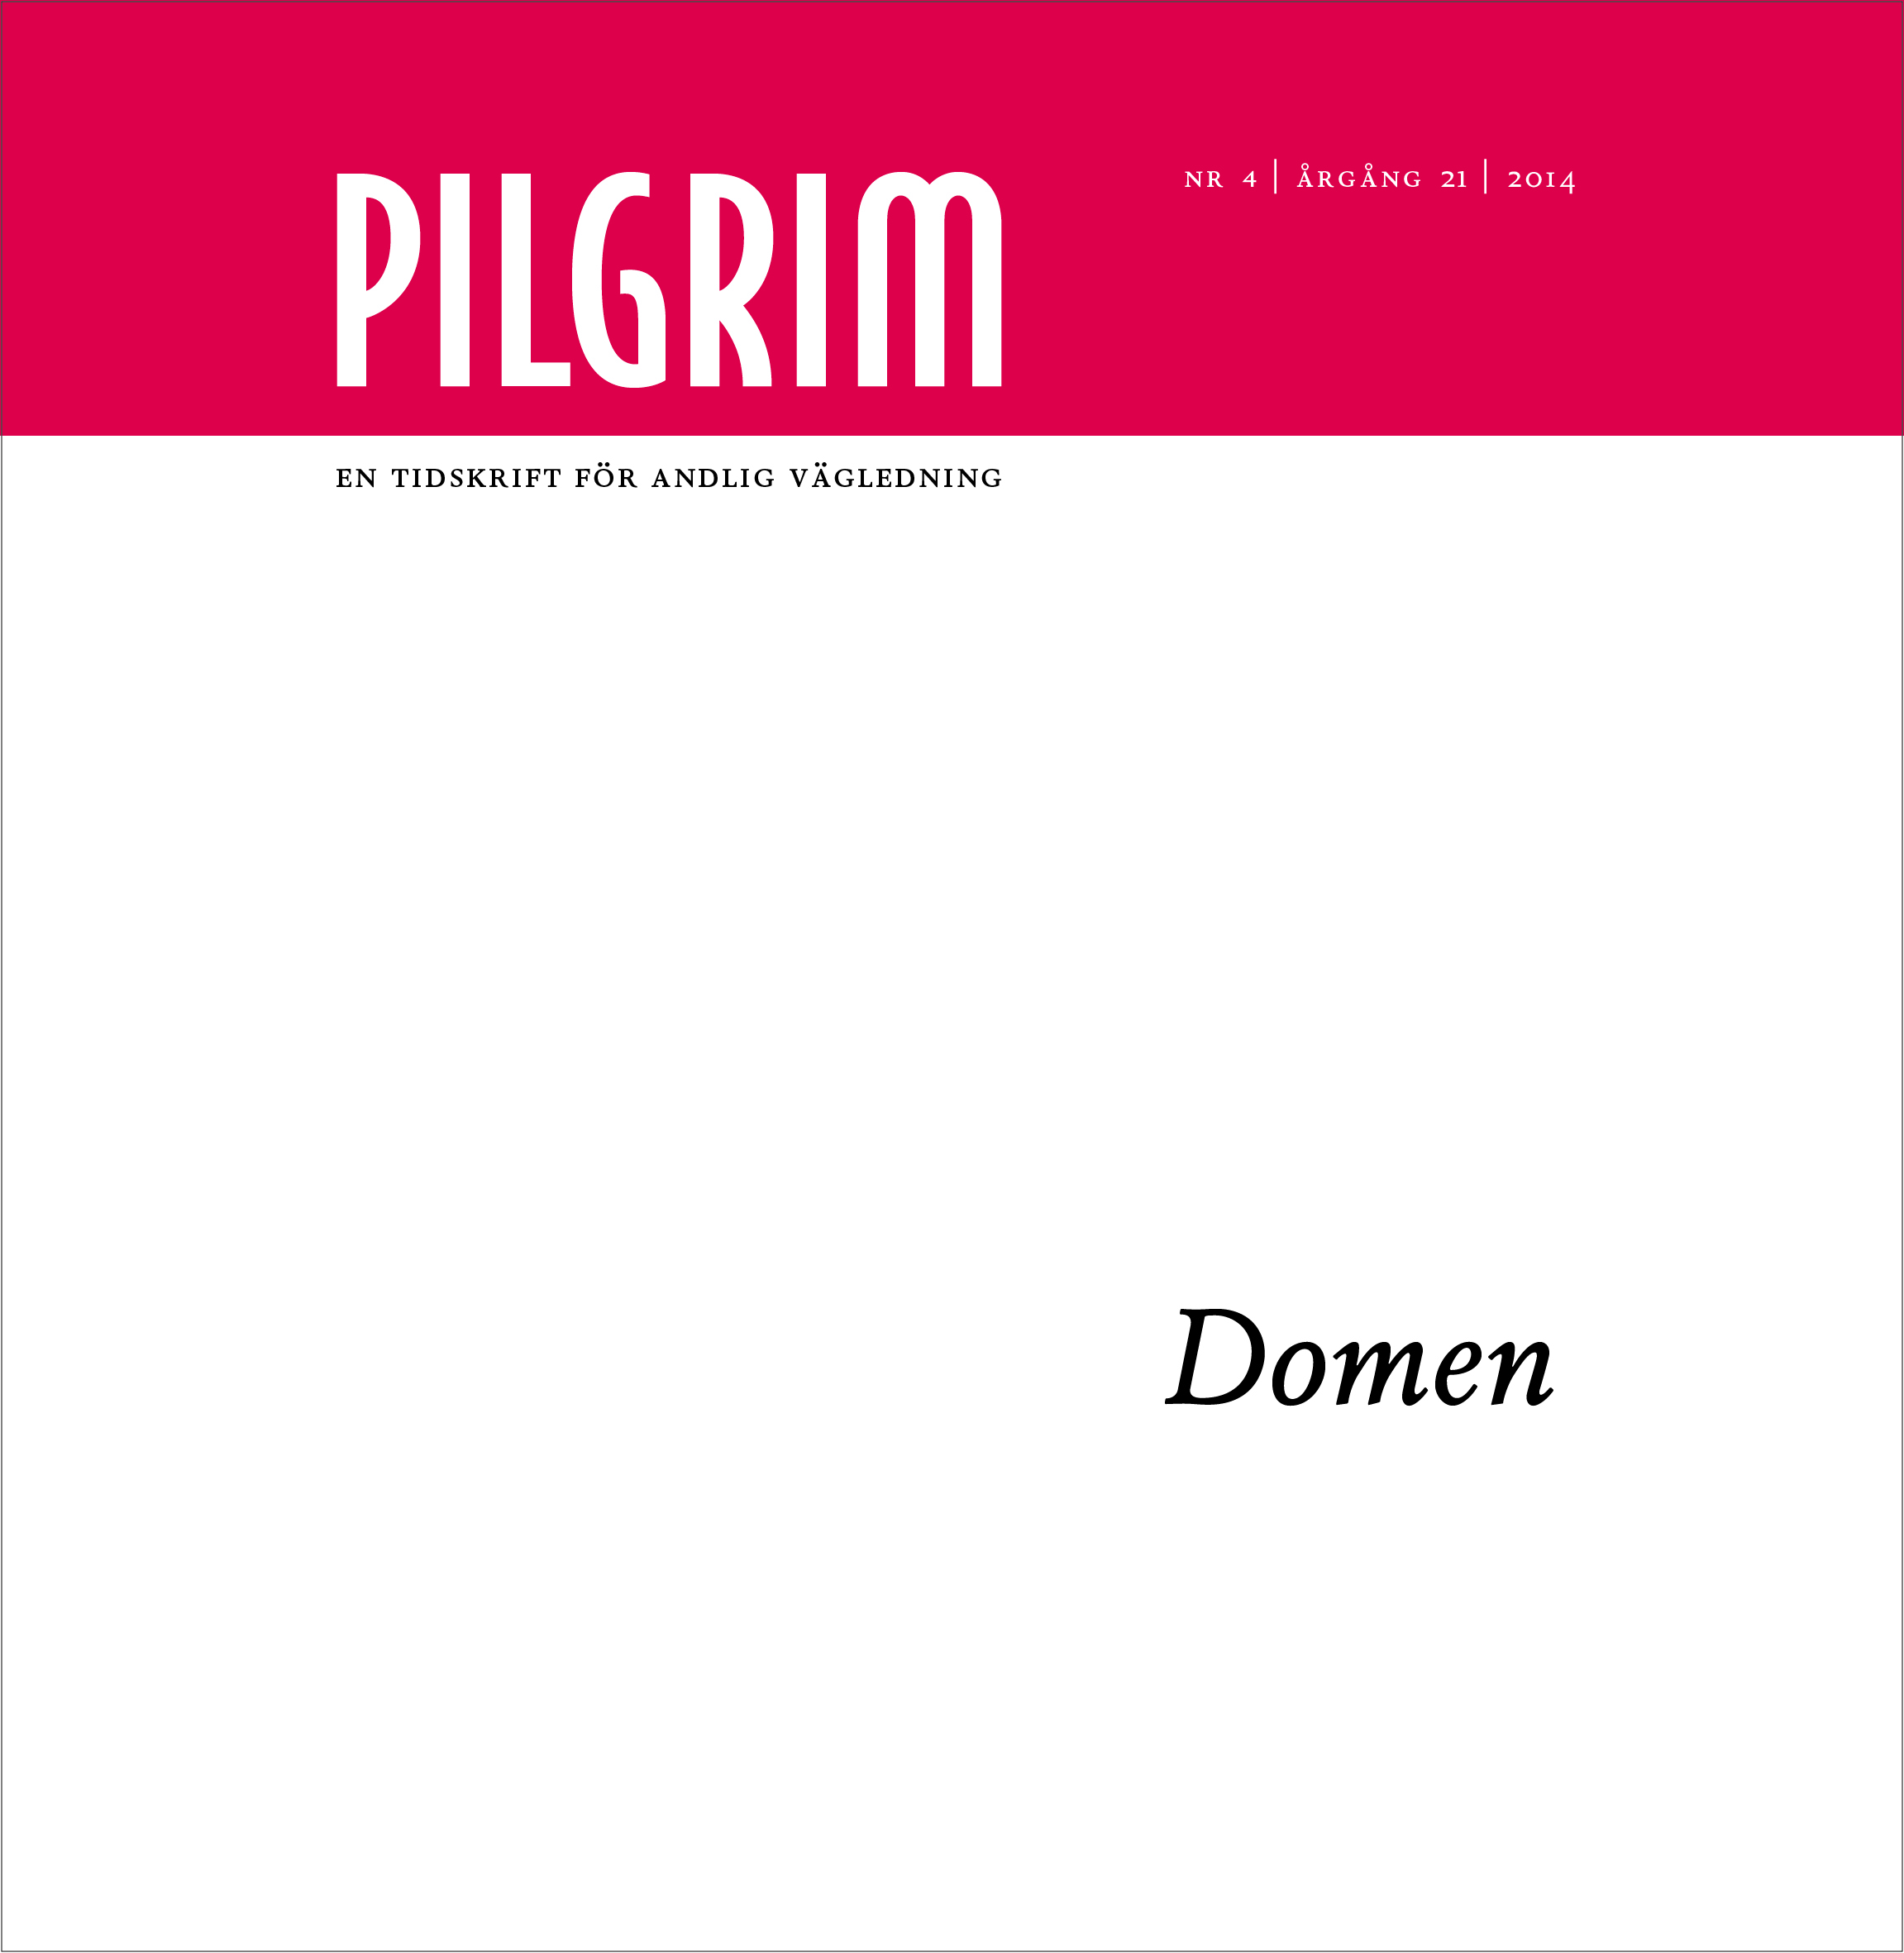 Pilgrim frams 2014-4